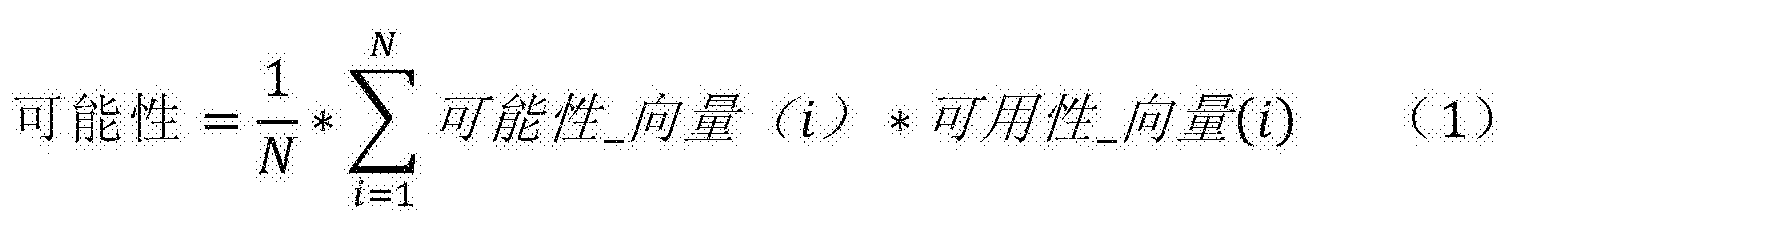 Figure CN107250830AD00141